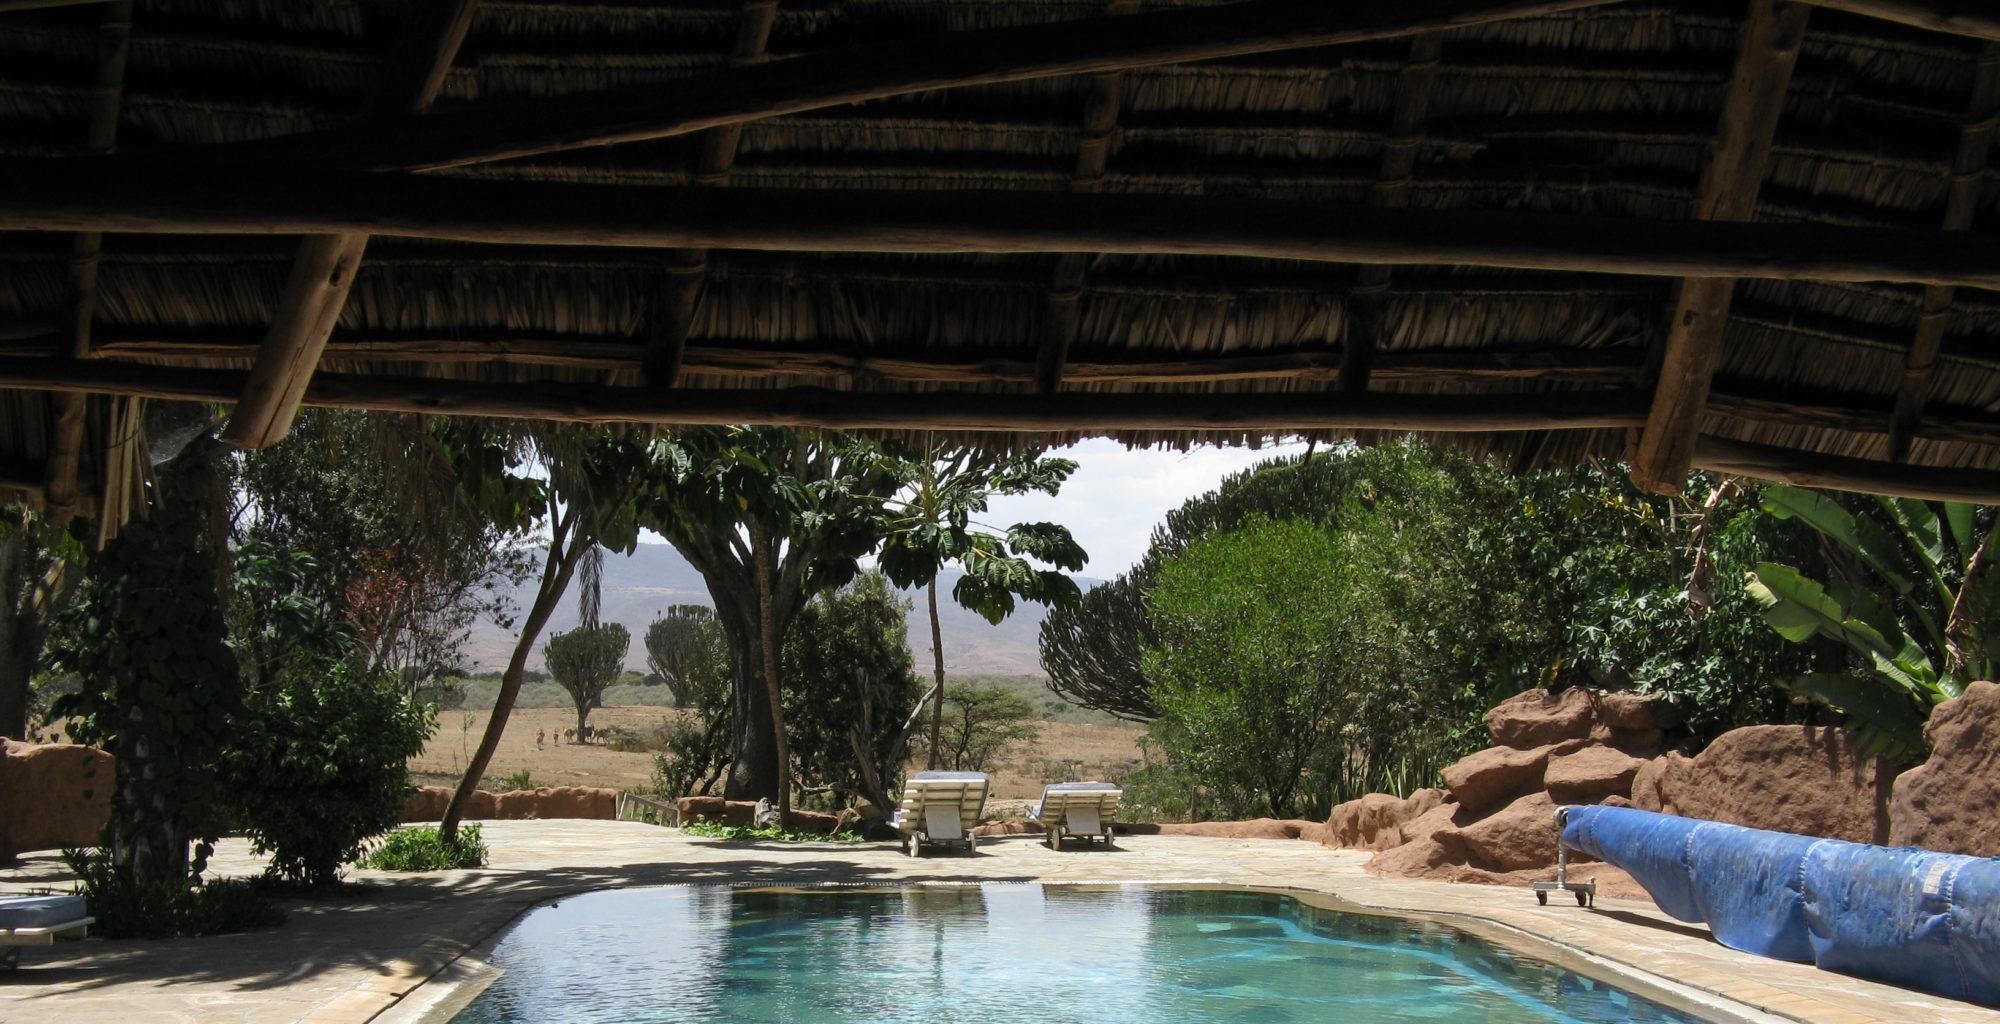 Chui Lodge Kenya Pool